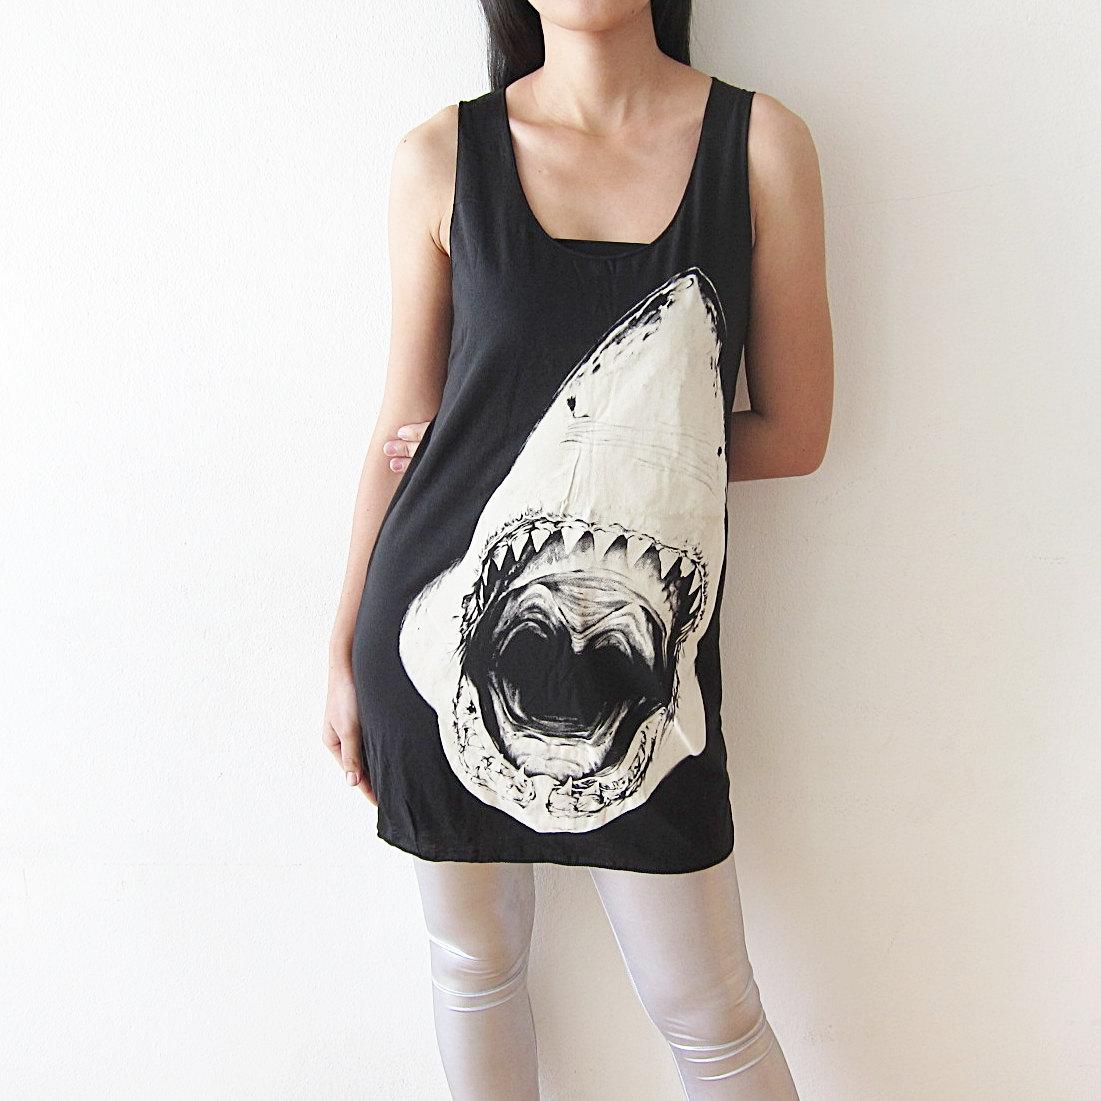 Shark shirt tank top women t shirt size m by punkrocktshirt for Shark tank t shirt printing